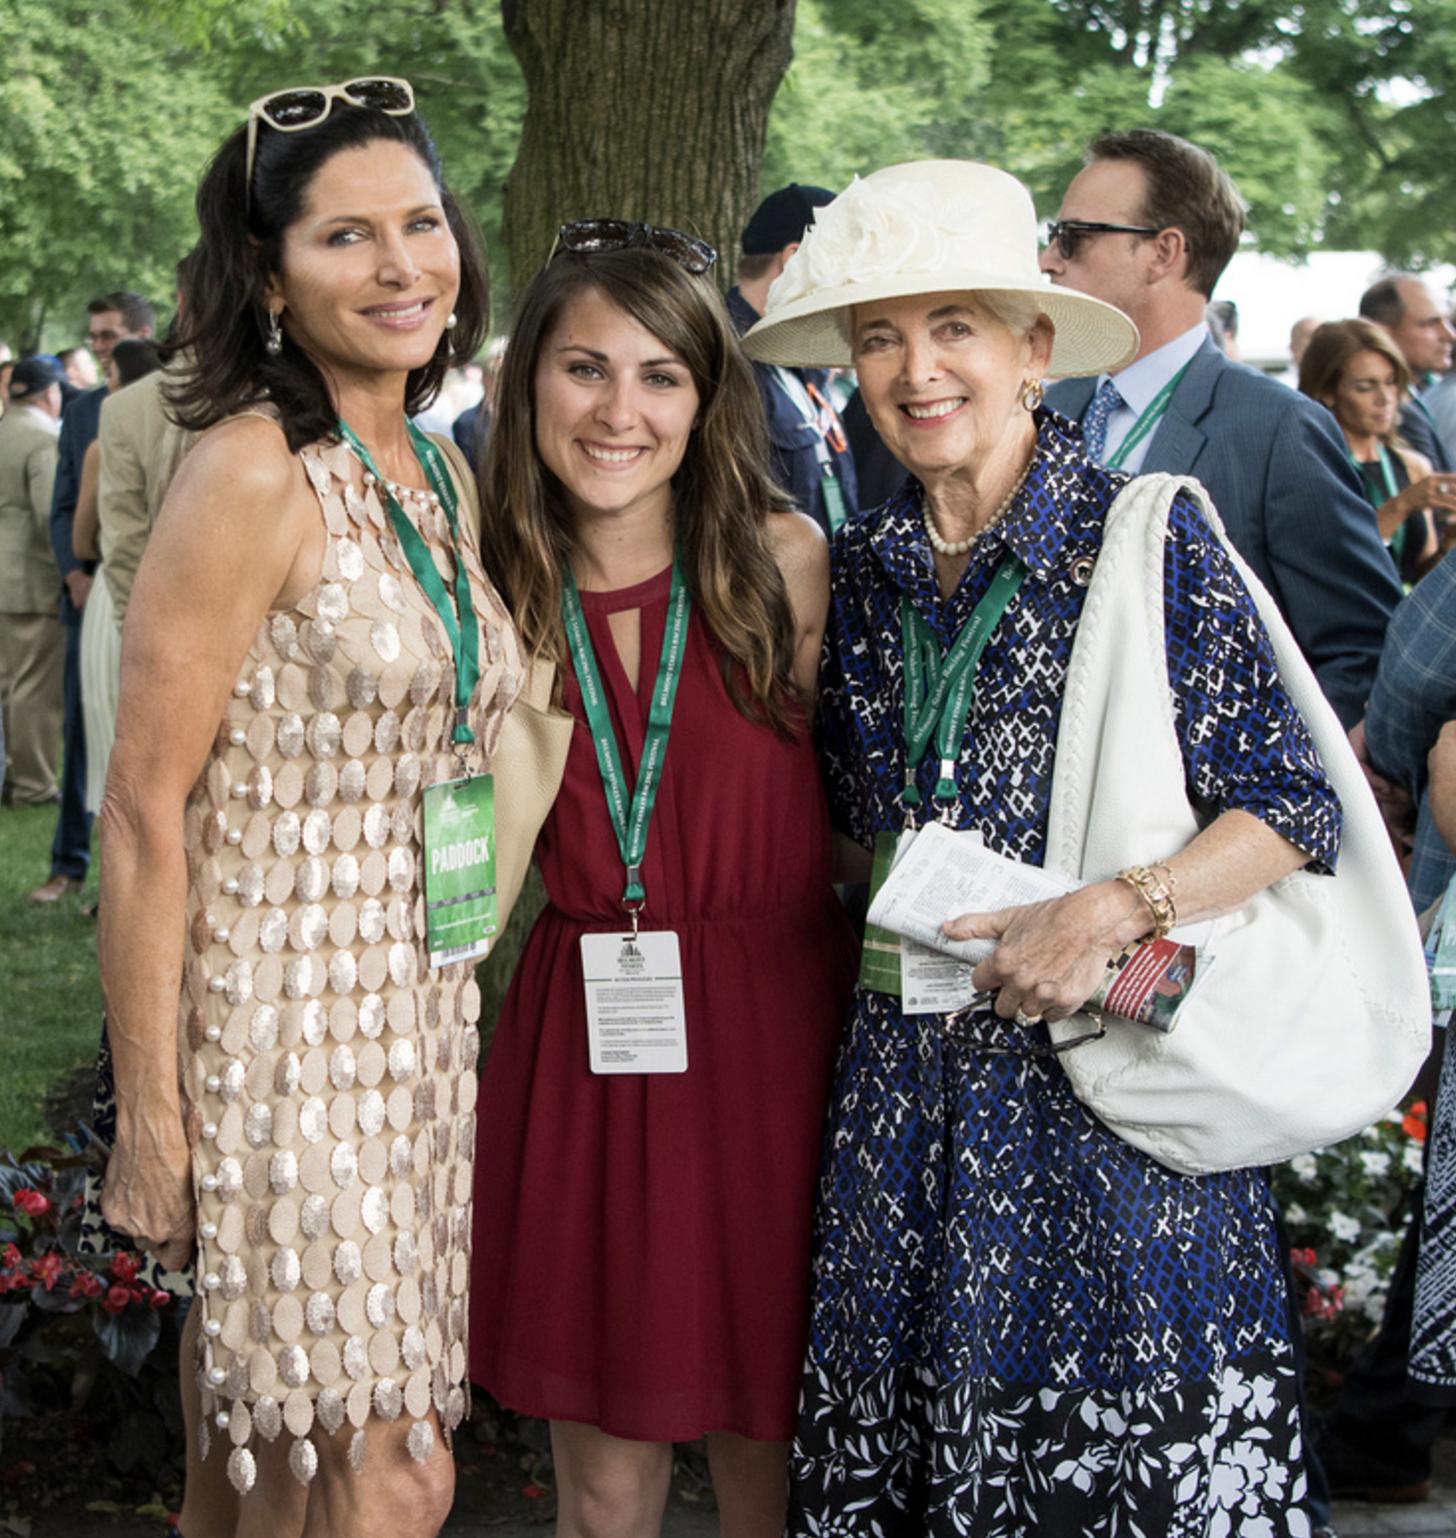 Sheila Rosenblum, Christie DeBernardis and Vivien